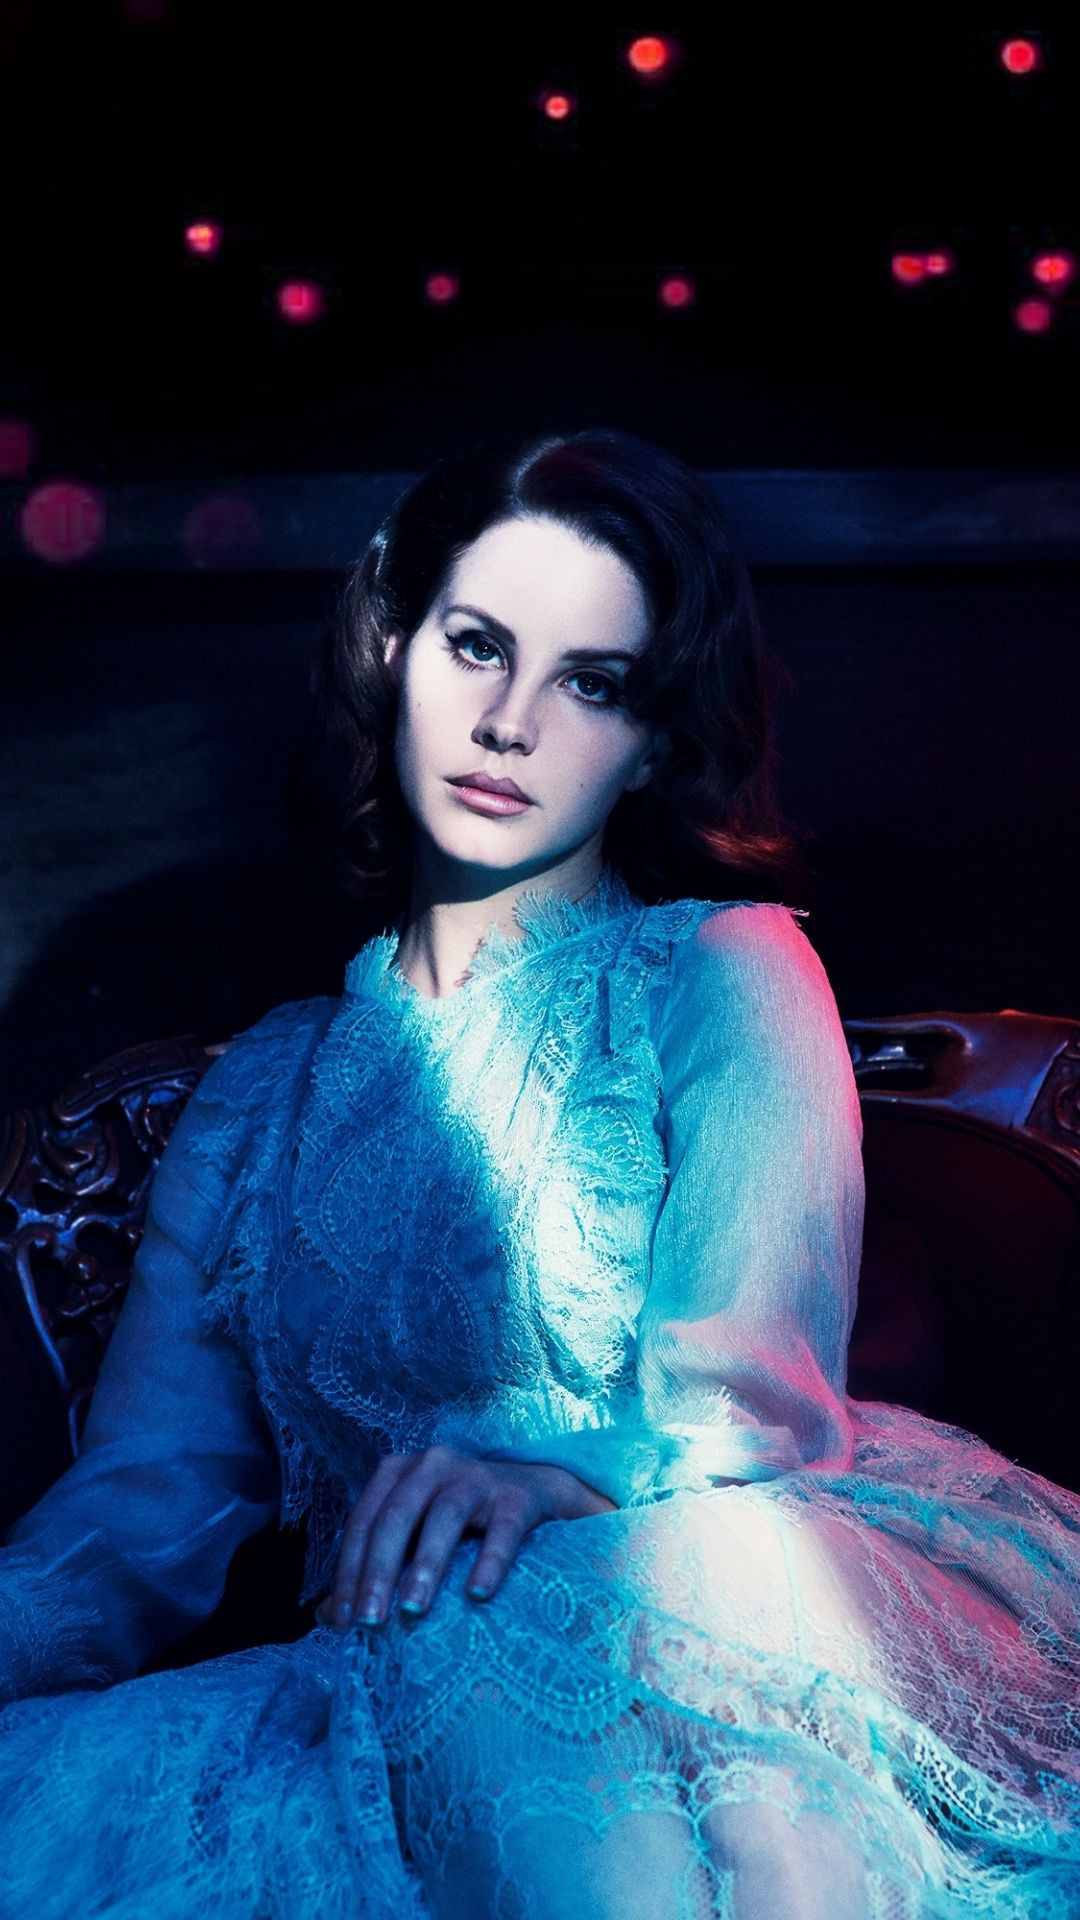 Lana Del Rey Celebrity Complex Magazine 1080x1920 Wallpaper Celebrity Wallpapers Lana Del Rey Celebrities